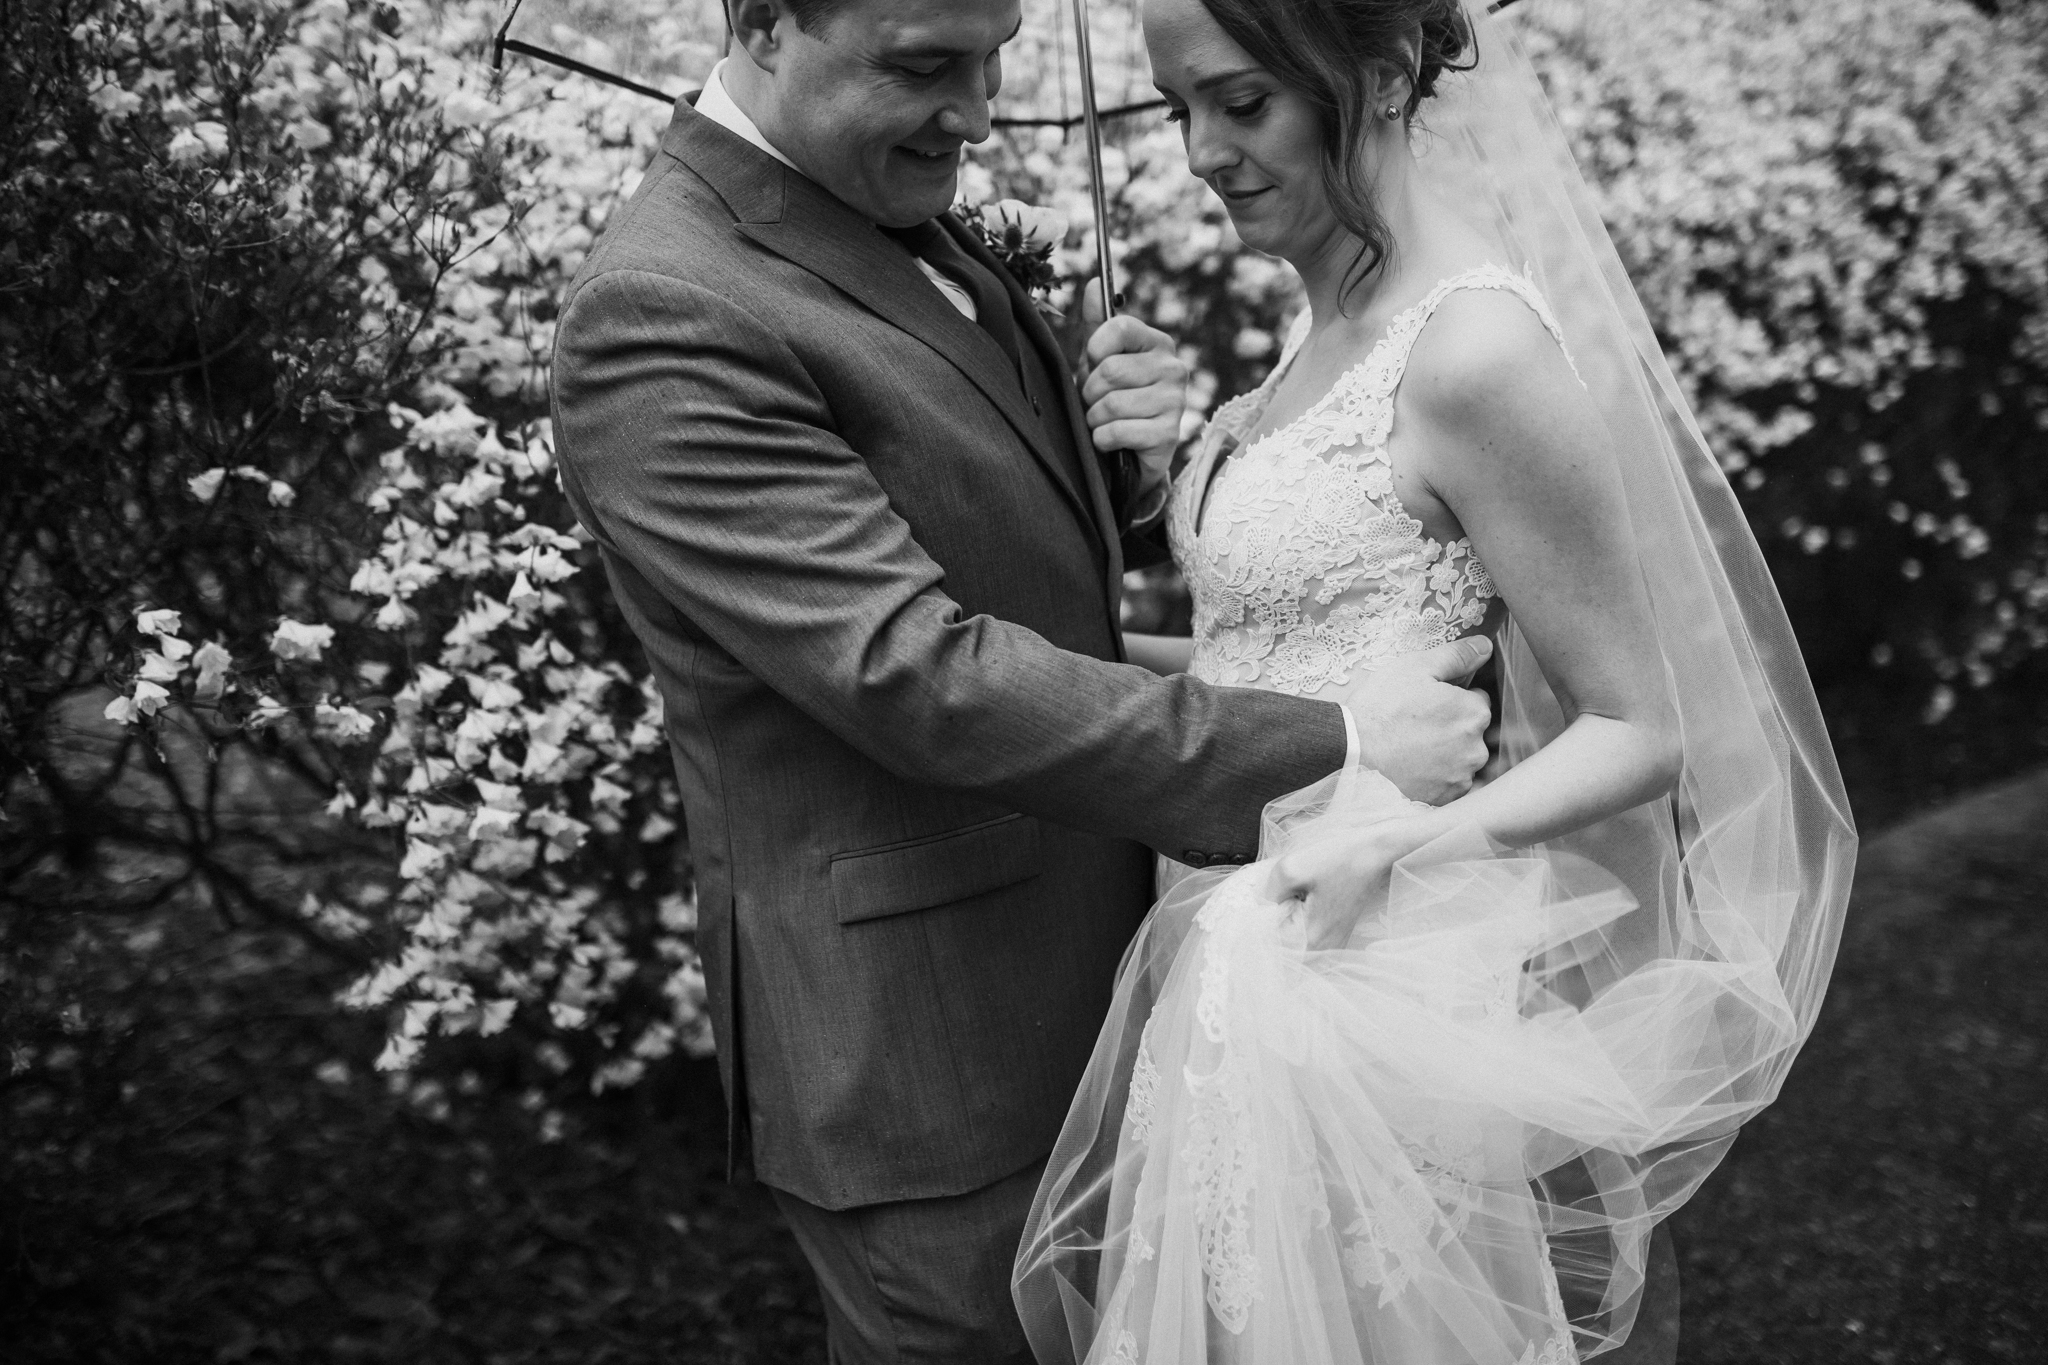 birmingham-alabama-wedding-photographer-laura-terry-the-warmth-around-you (48 of 110).jpg